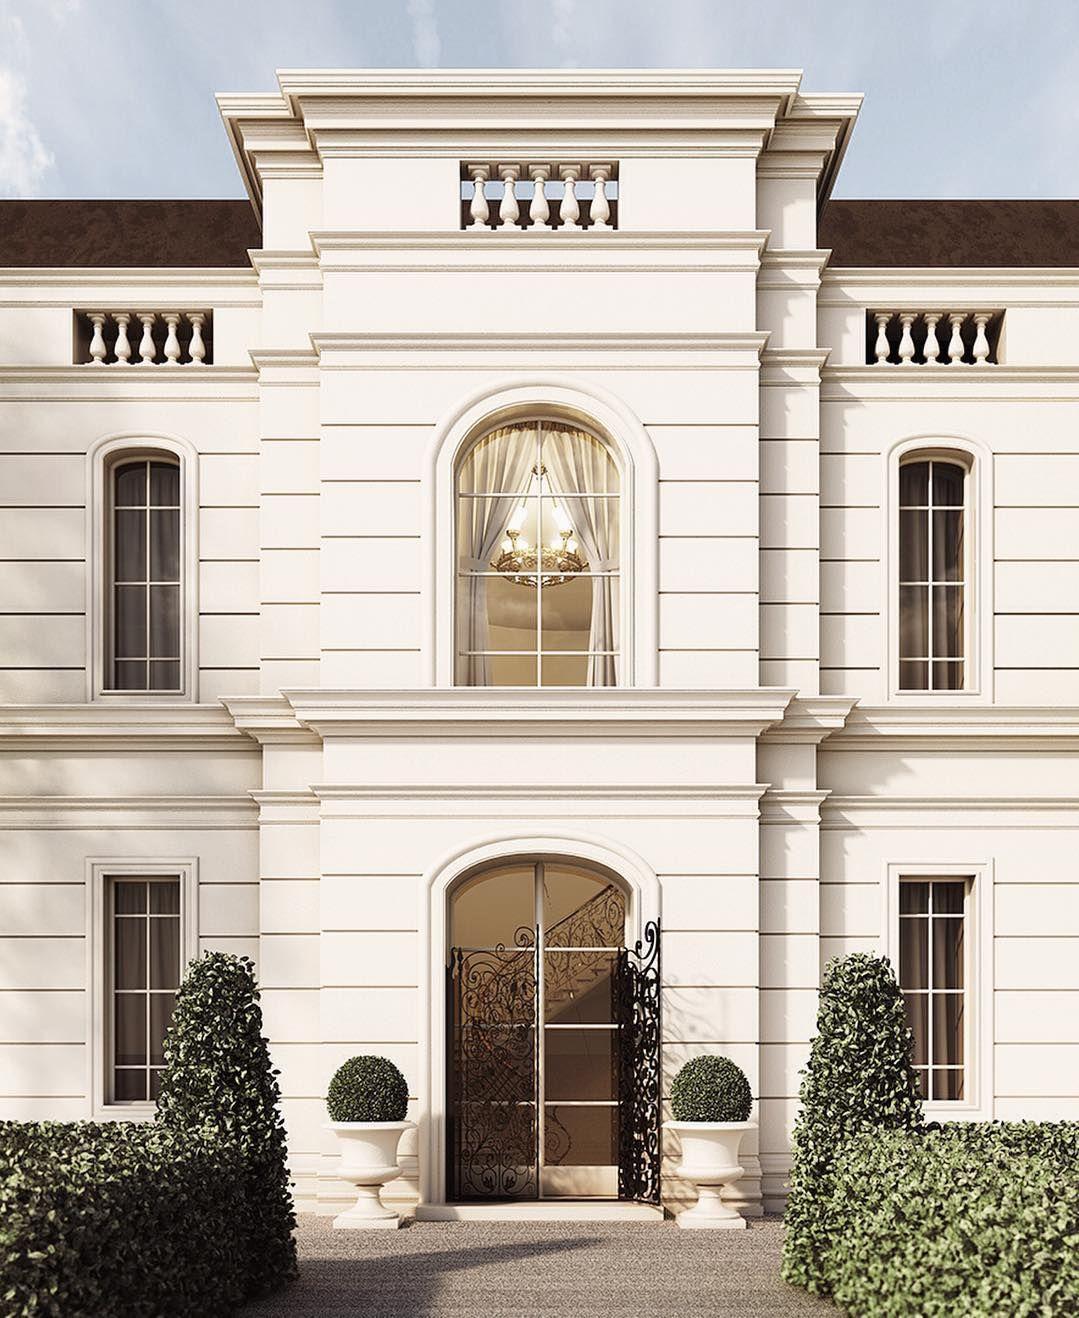 #bruger#brugerstudio#hdg#vray#c4d#rendering#archviz#love#render_contest#instarender#architecture#design#exterior#classic#light#windows#garden#pattern#geometric#street#villa#visualization#italy#simmetry#gate#bushes by bruger_studio